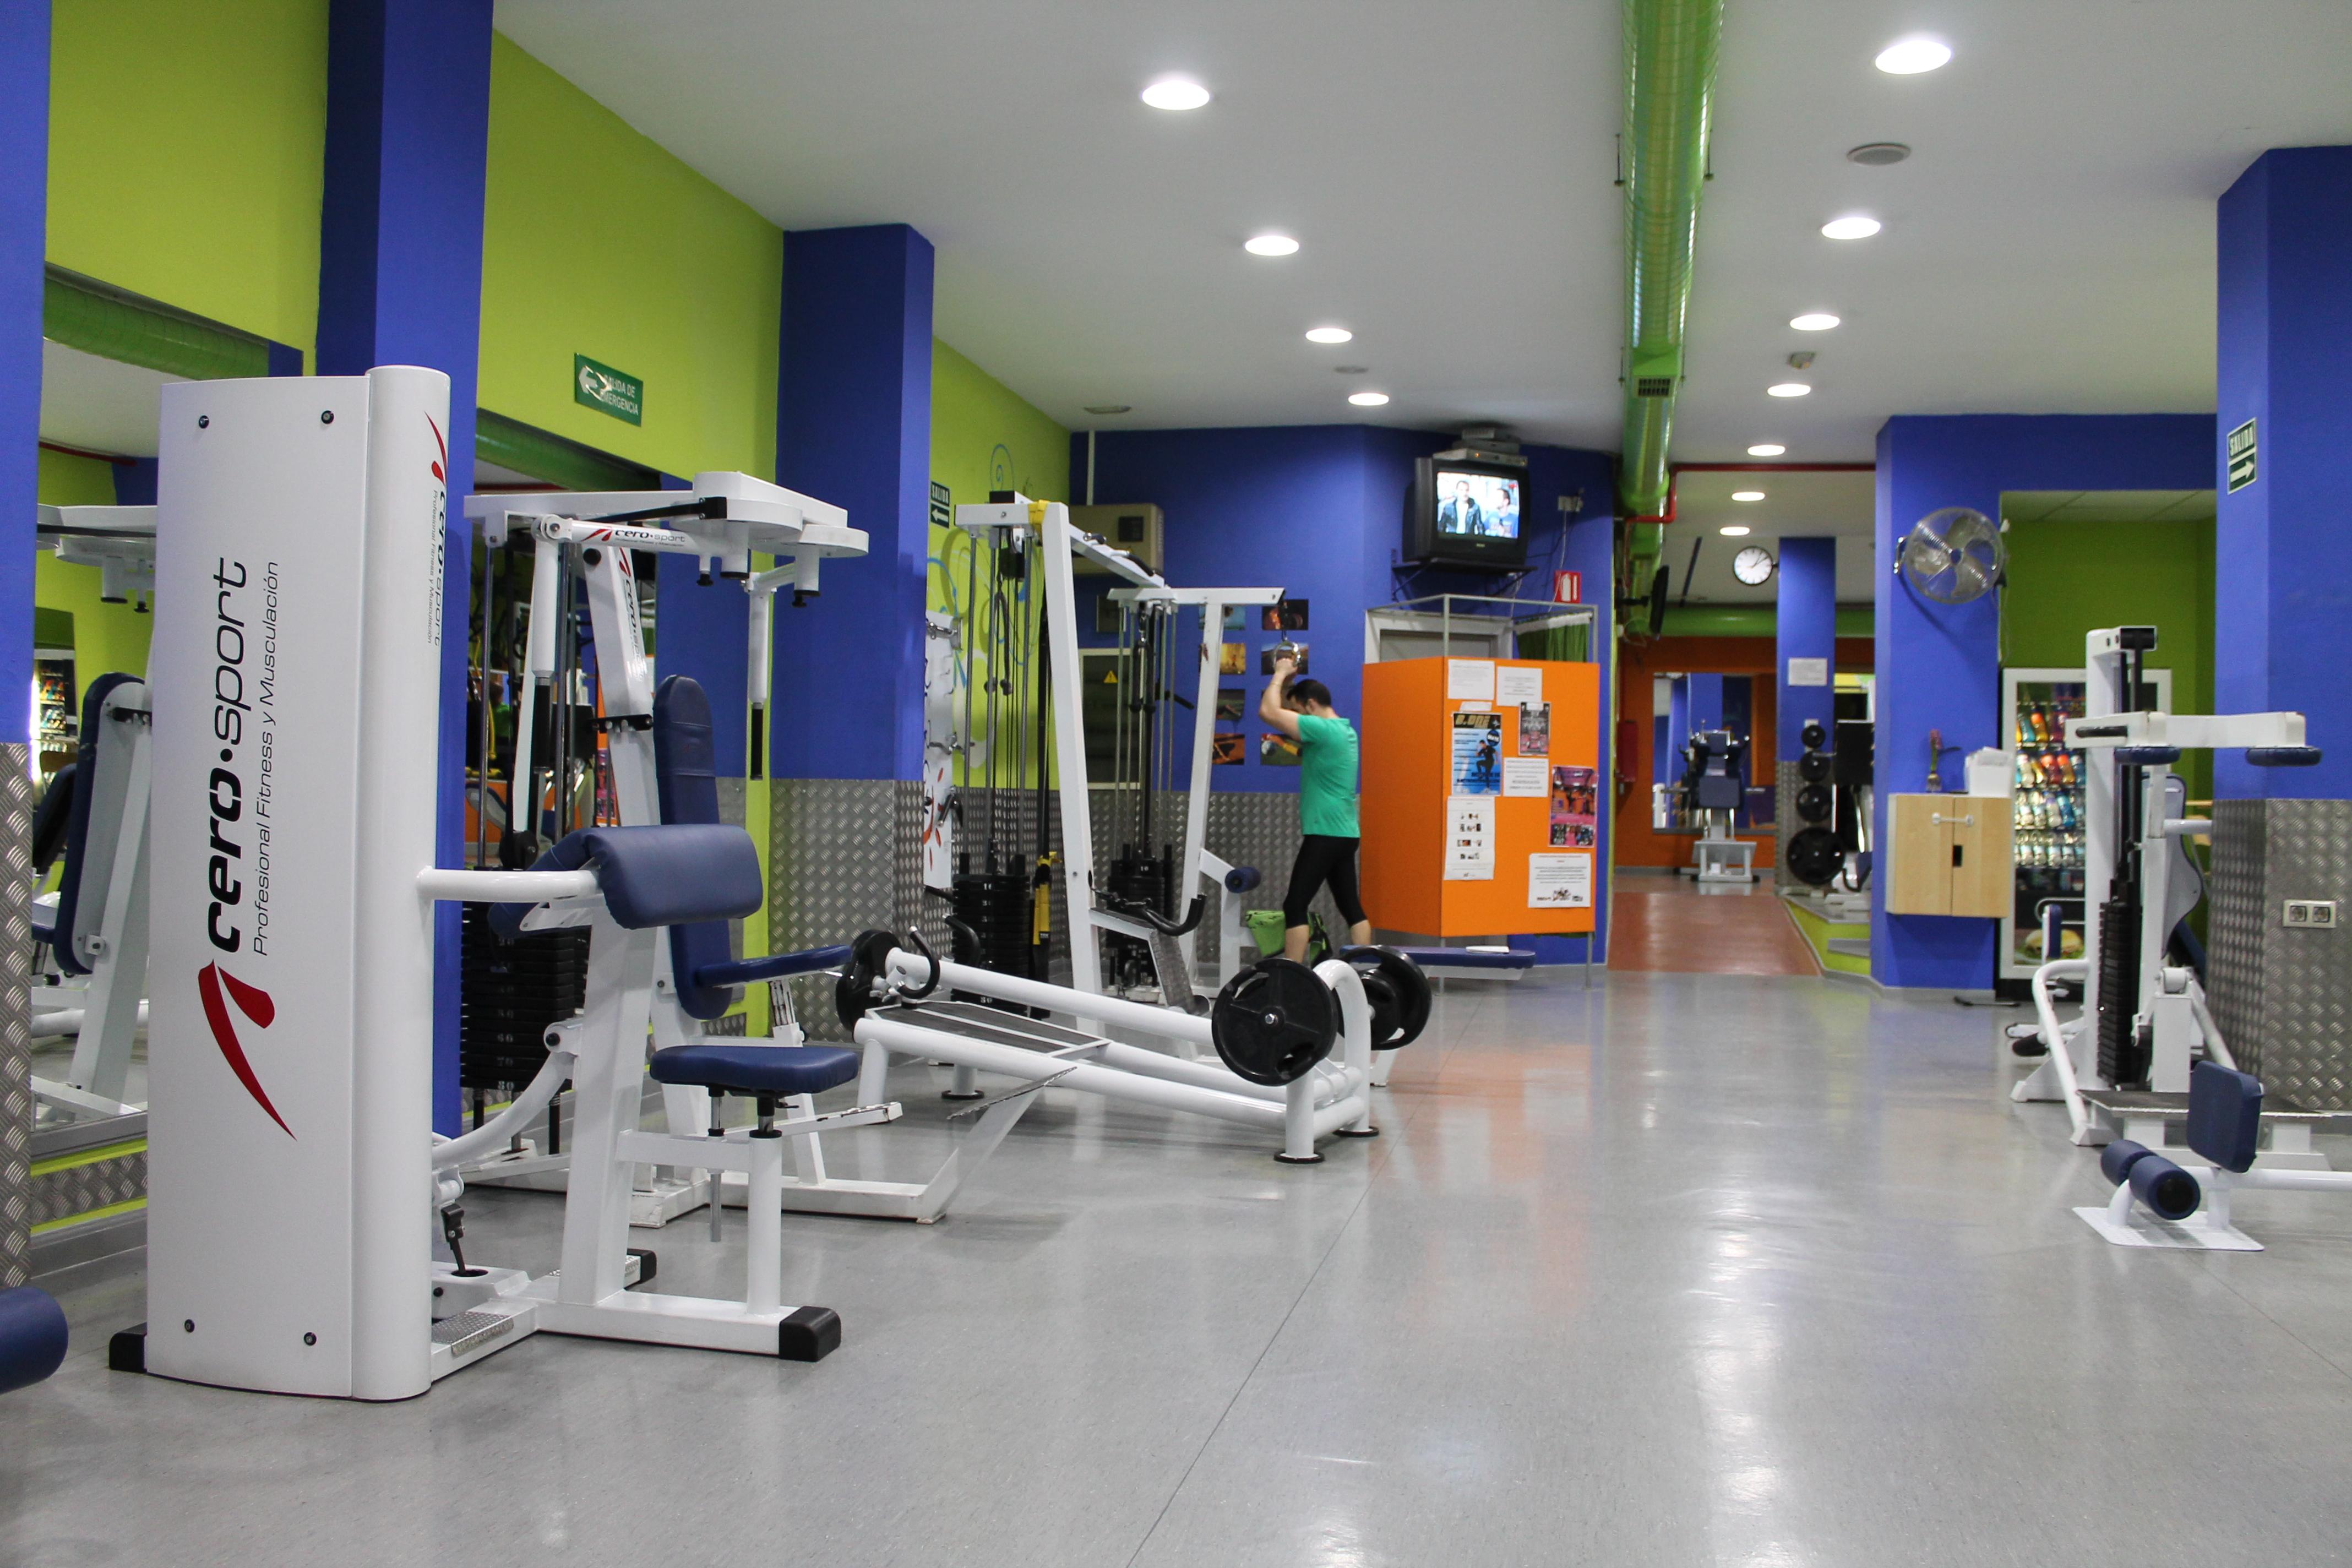 Ofertas bonos de gimnasio energy albacete for Gimnasio energy